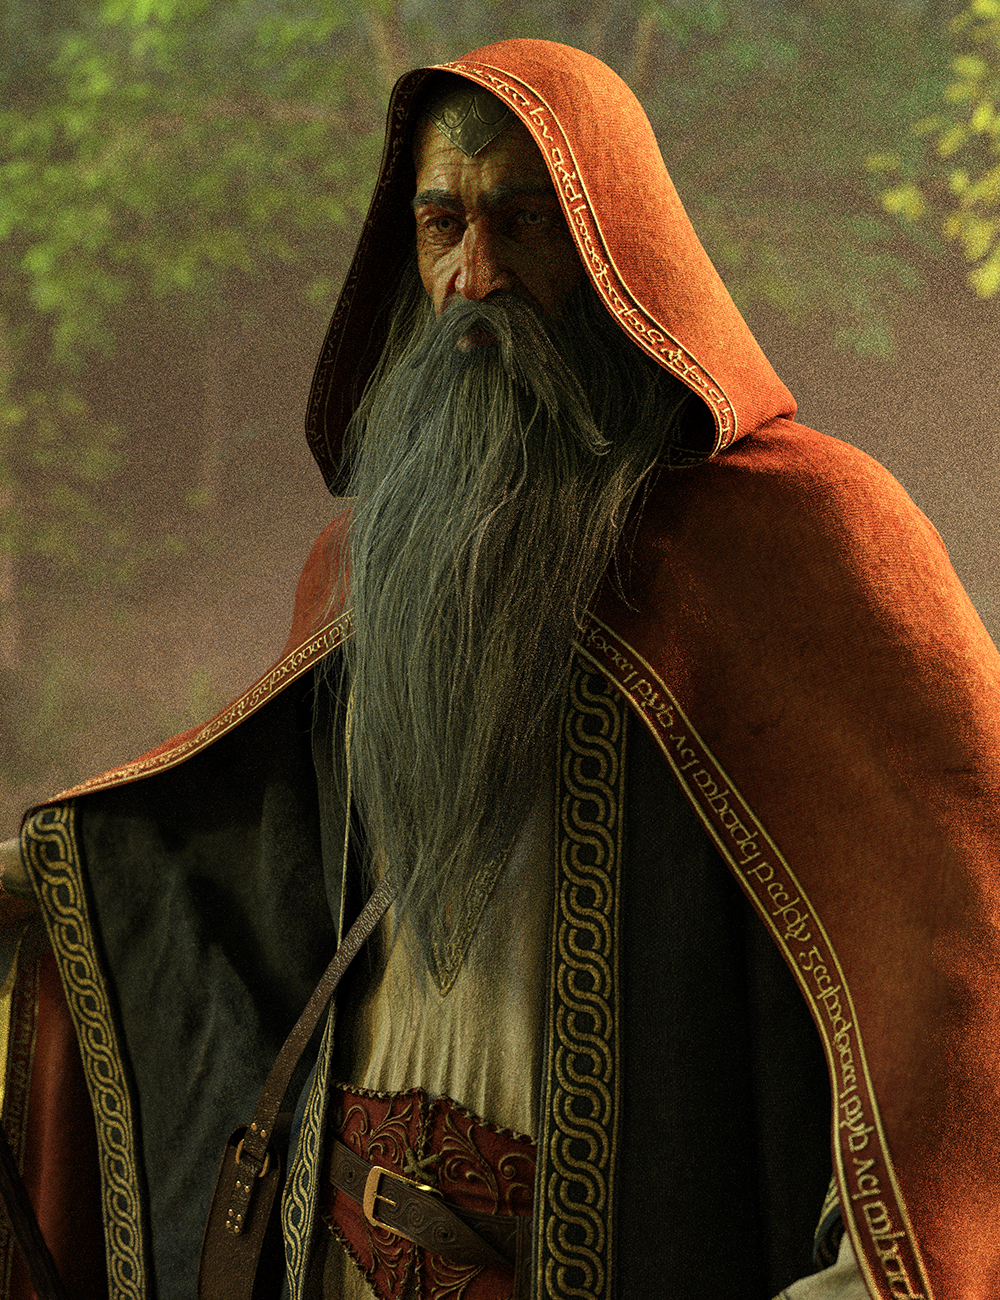 Wise Wizard HD Bundle by: Luthbel, 3D Models by Daz 3D